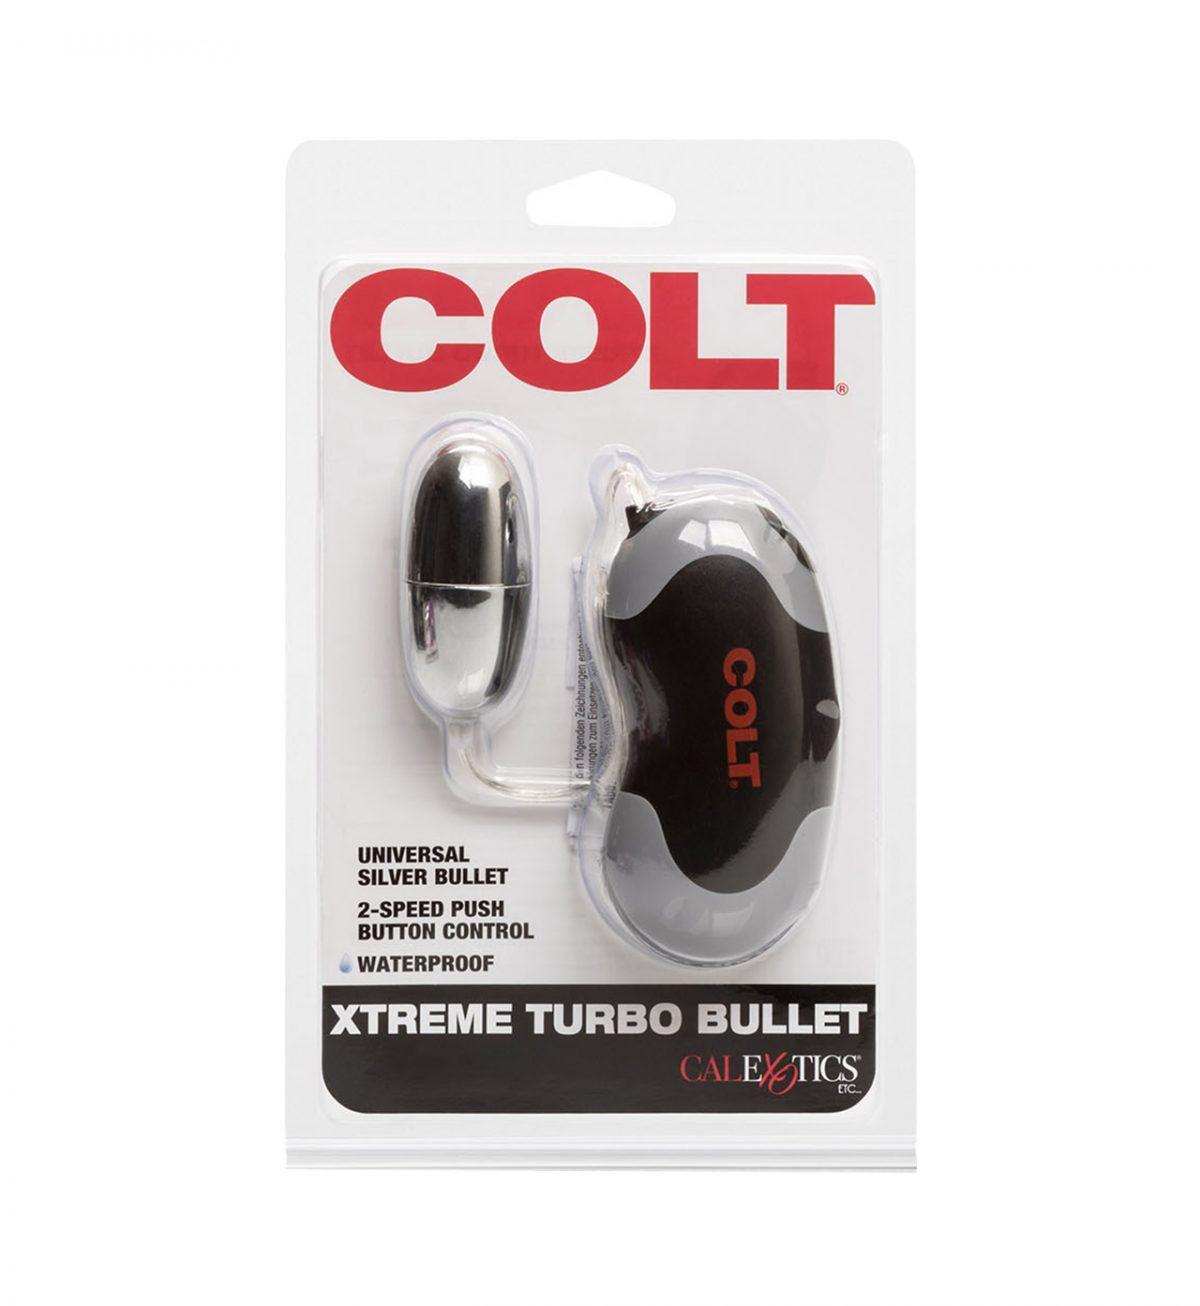 Xtreme Turbo Bullet - Kraftfull eggformet vibrator - COLT